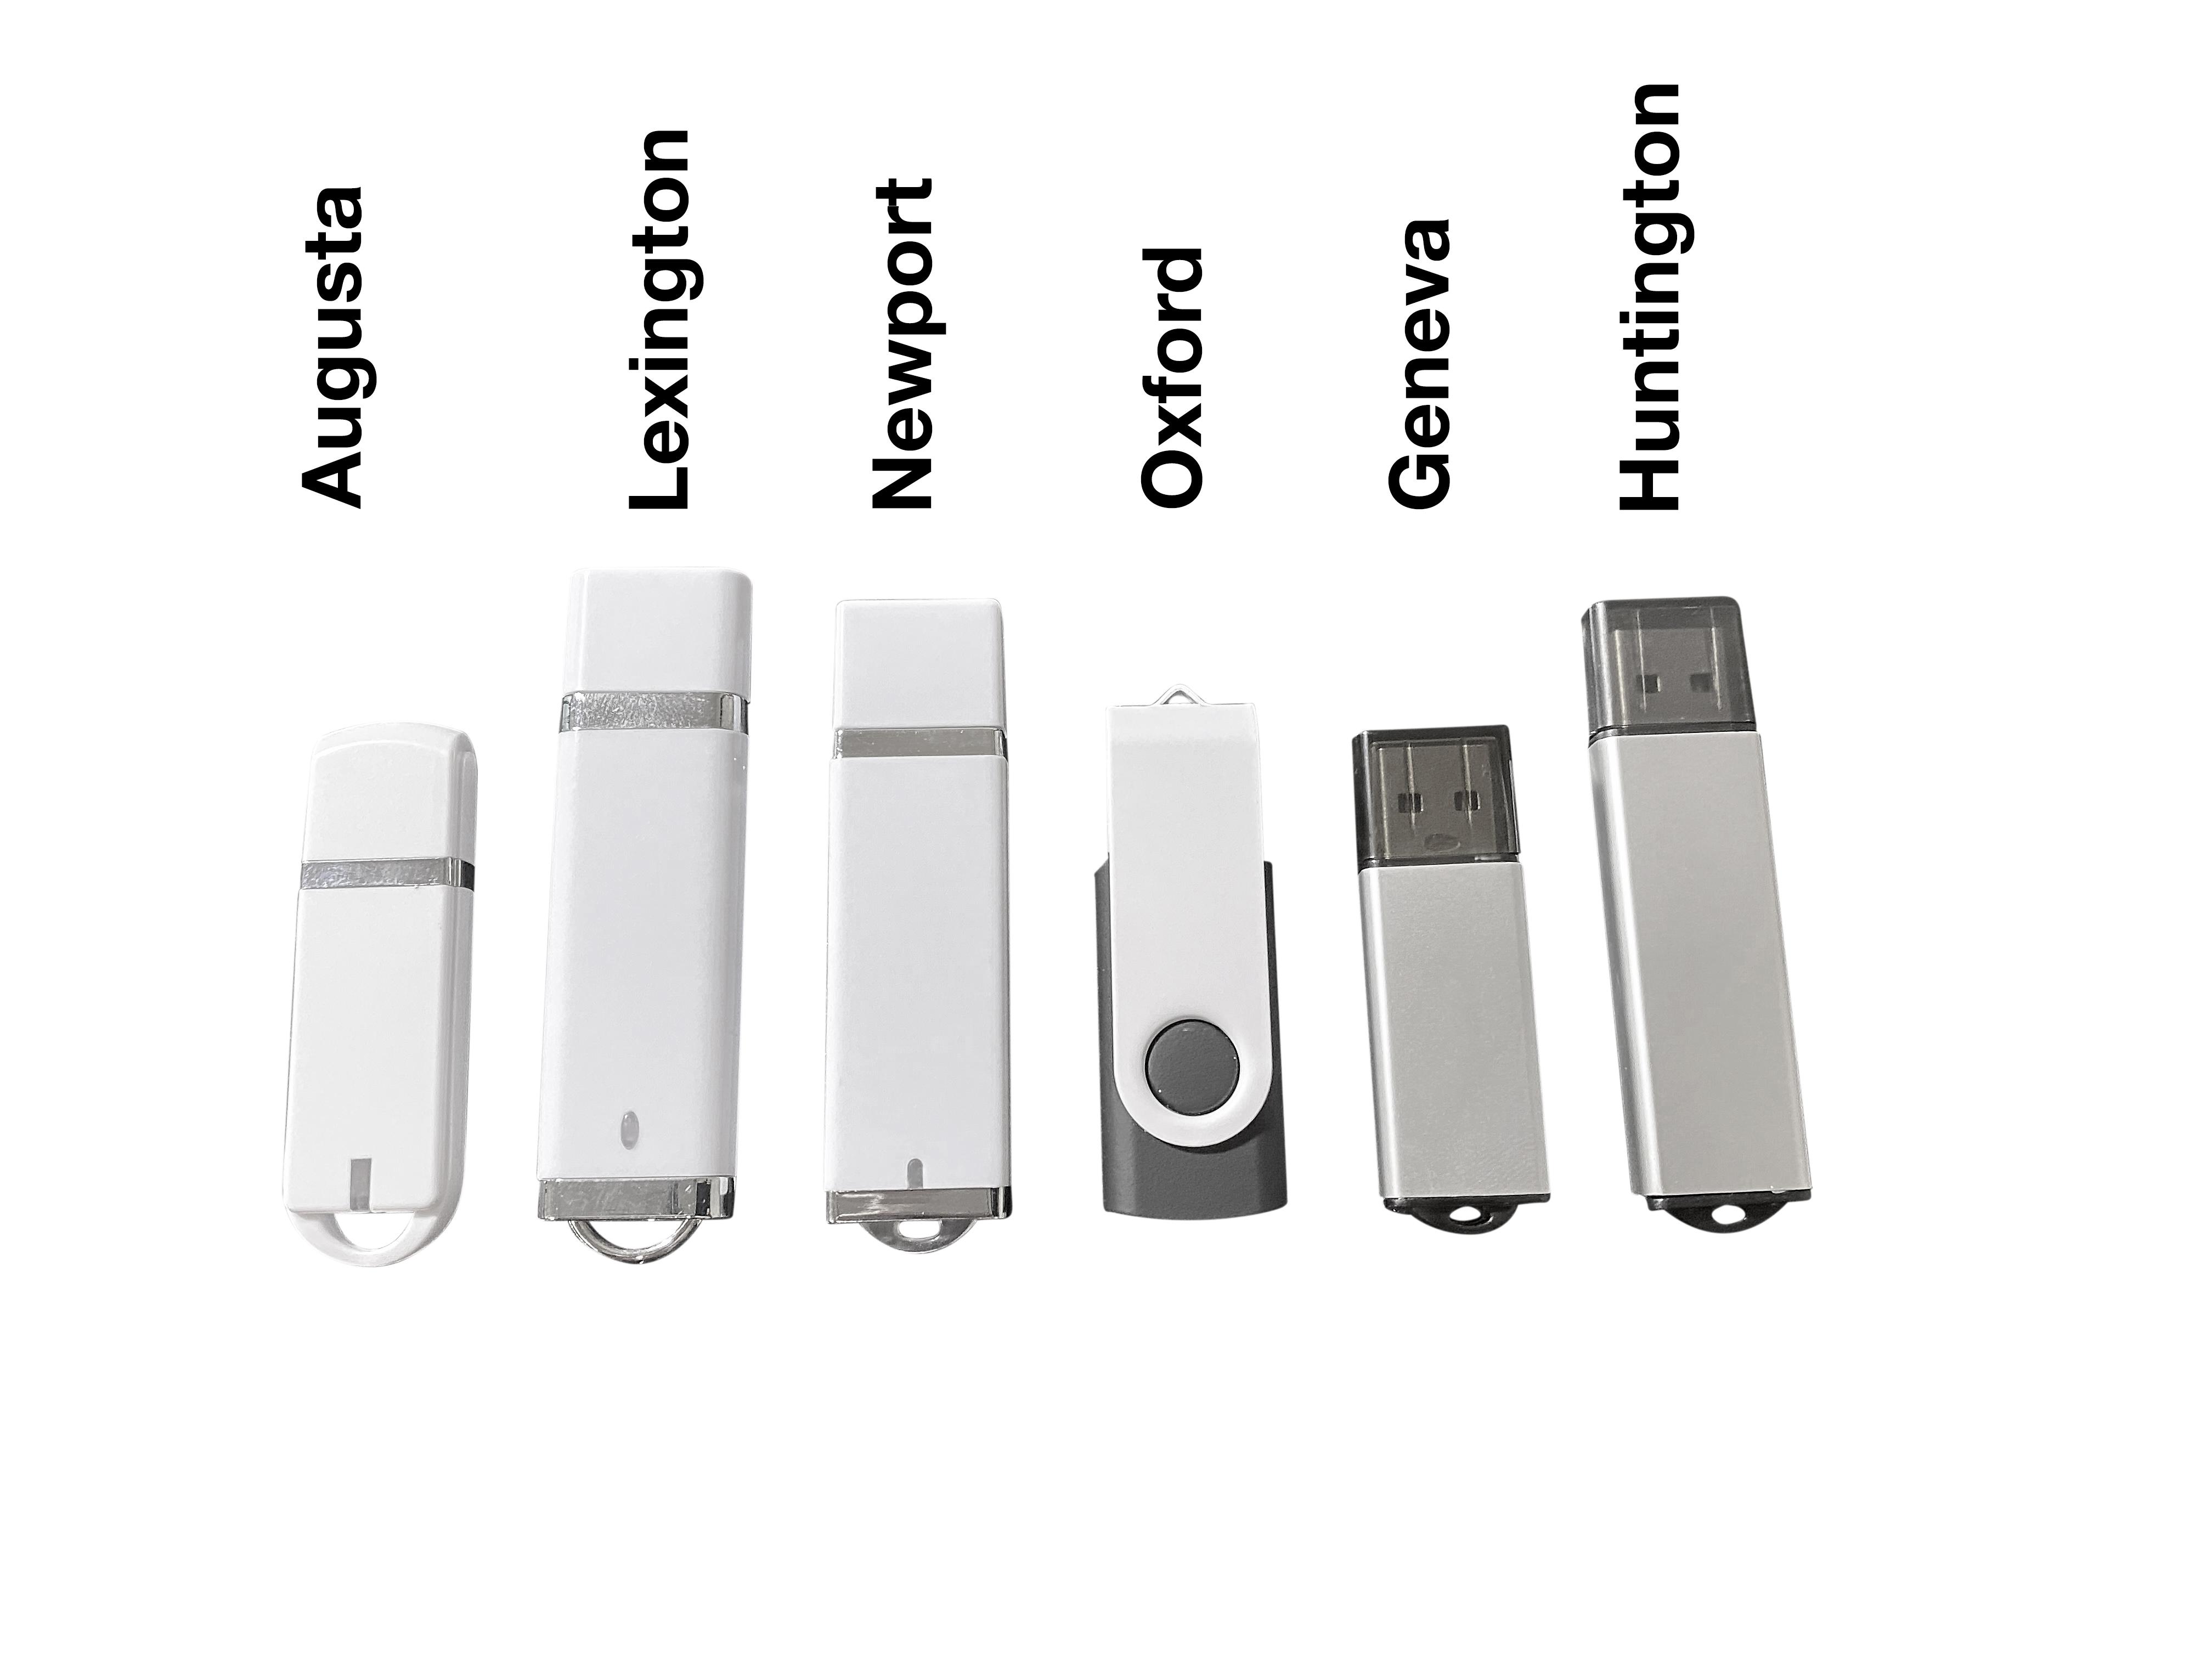 USB Flash Drive Copy Protection